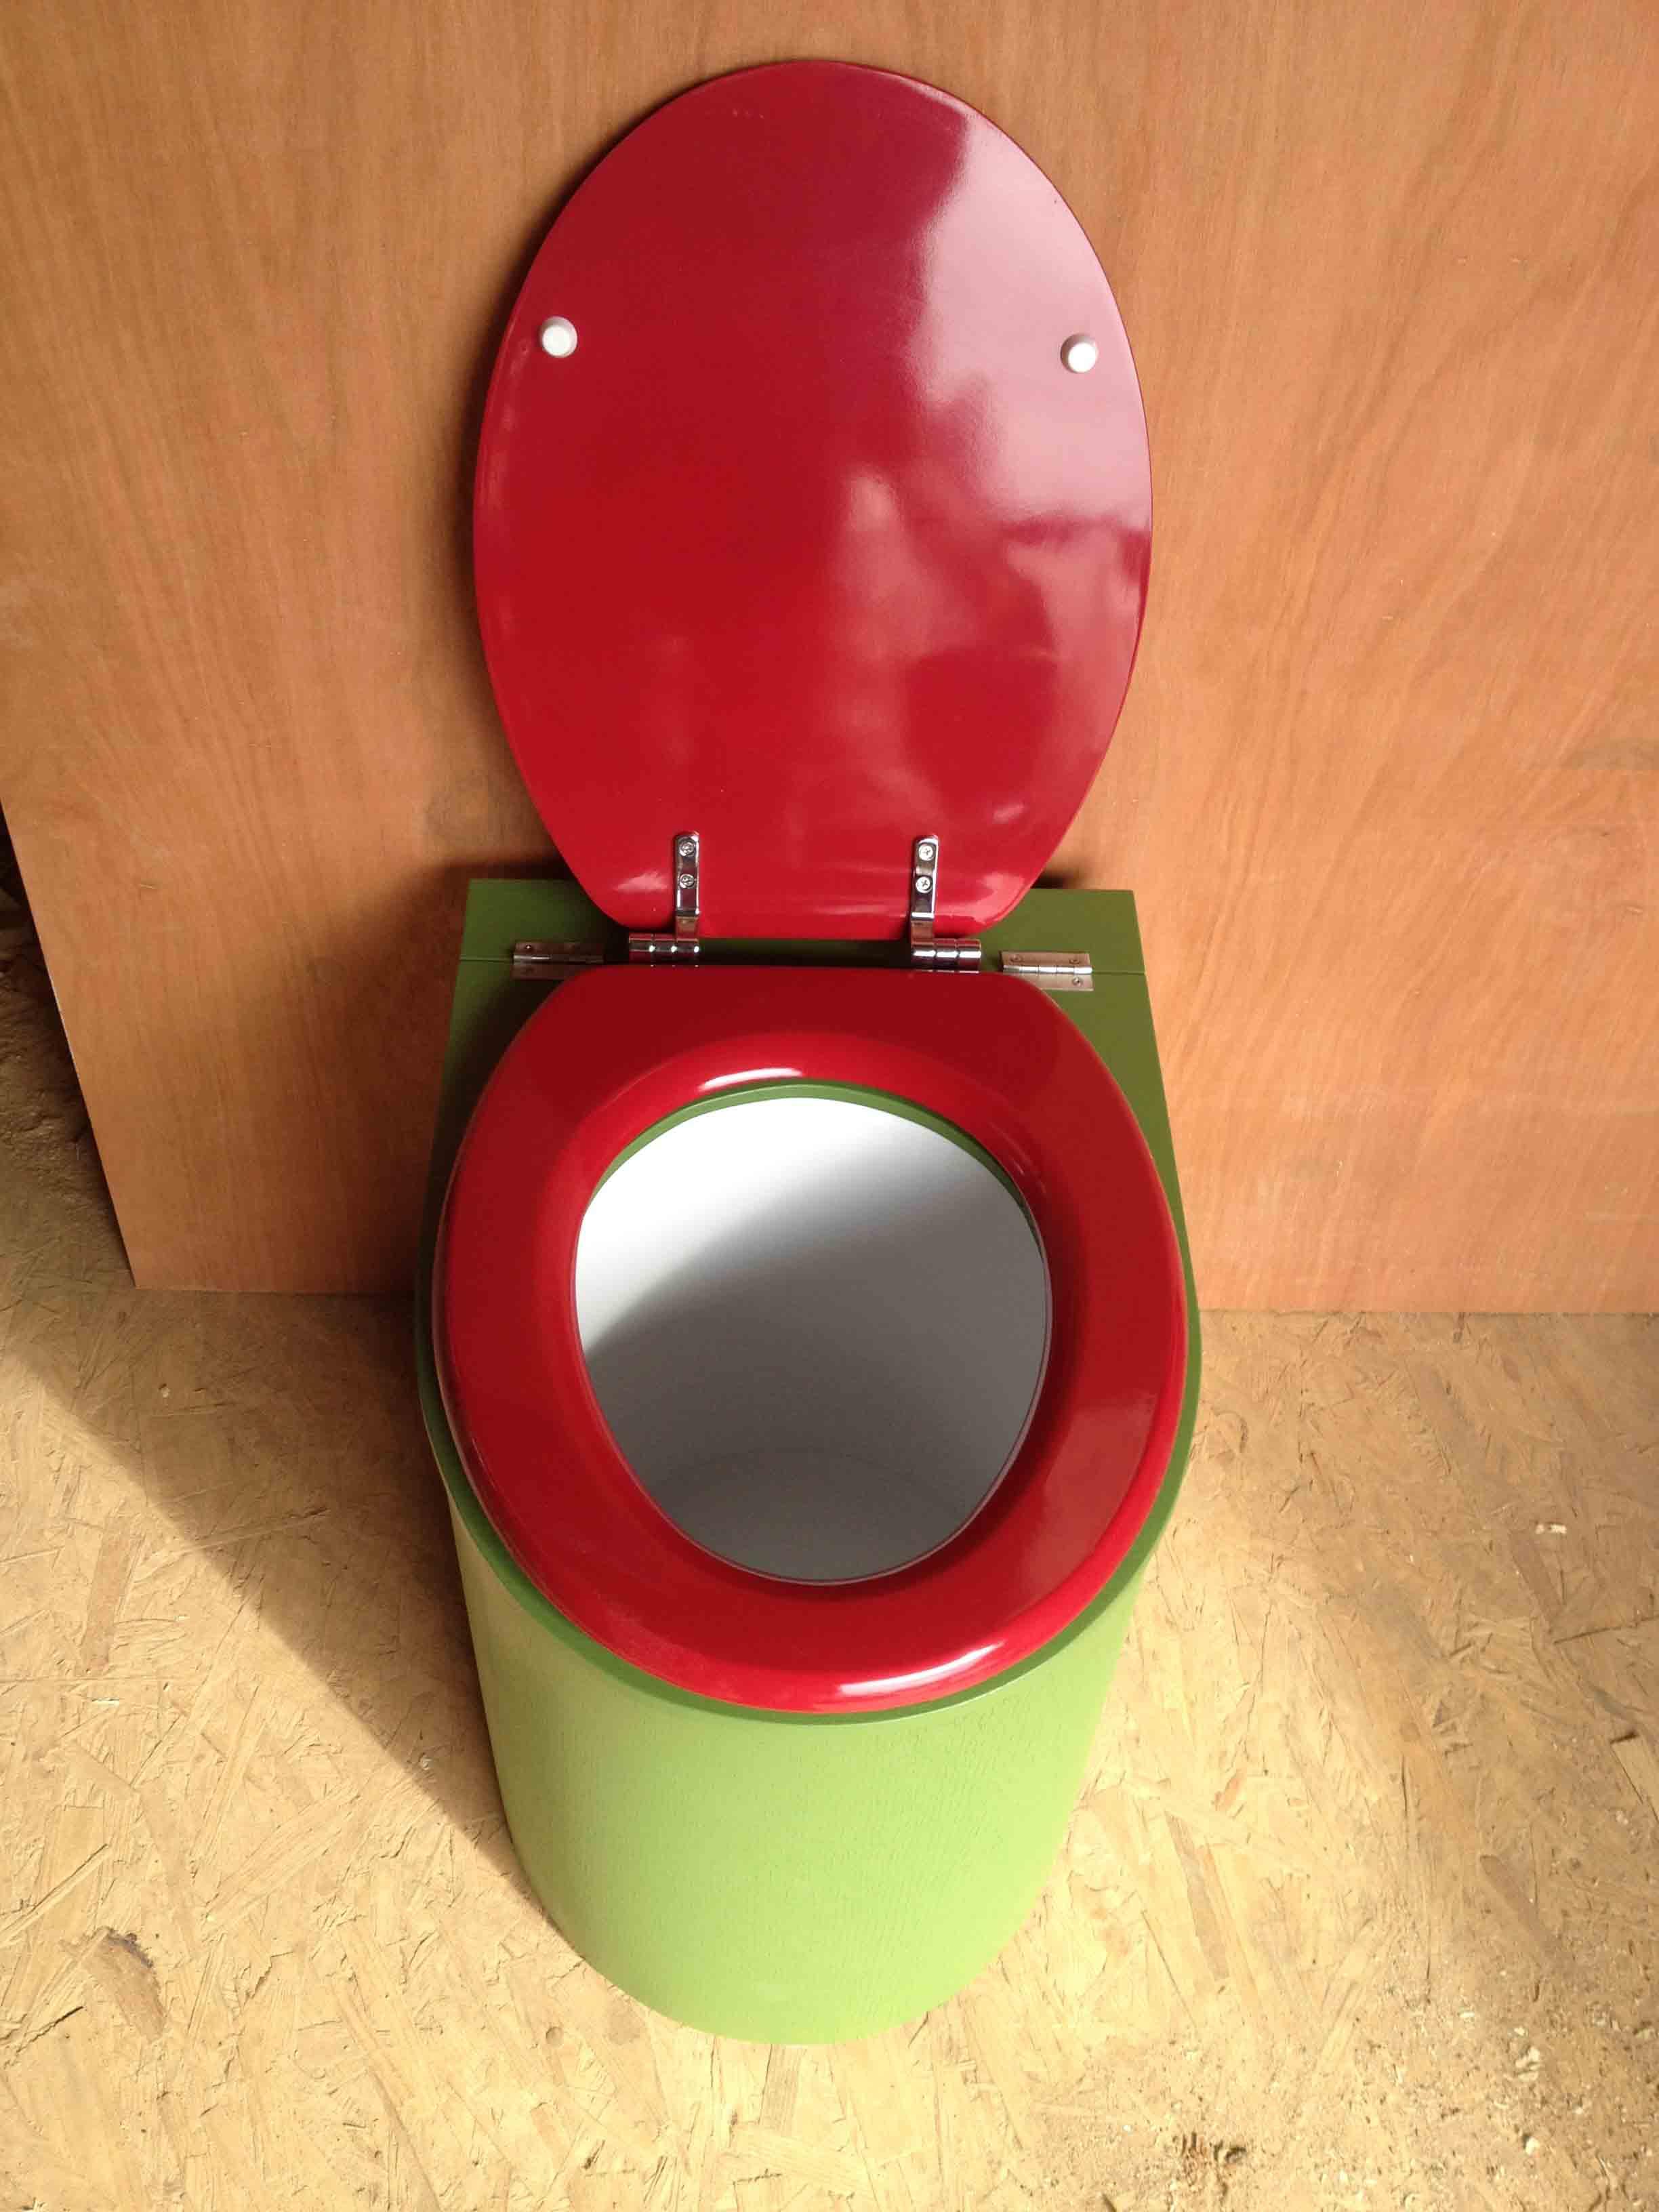 Toilette seche design vert